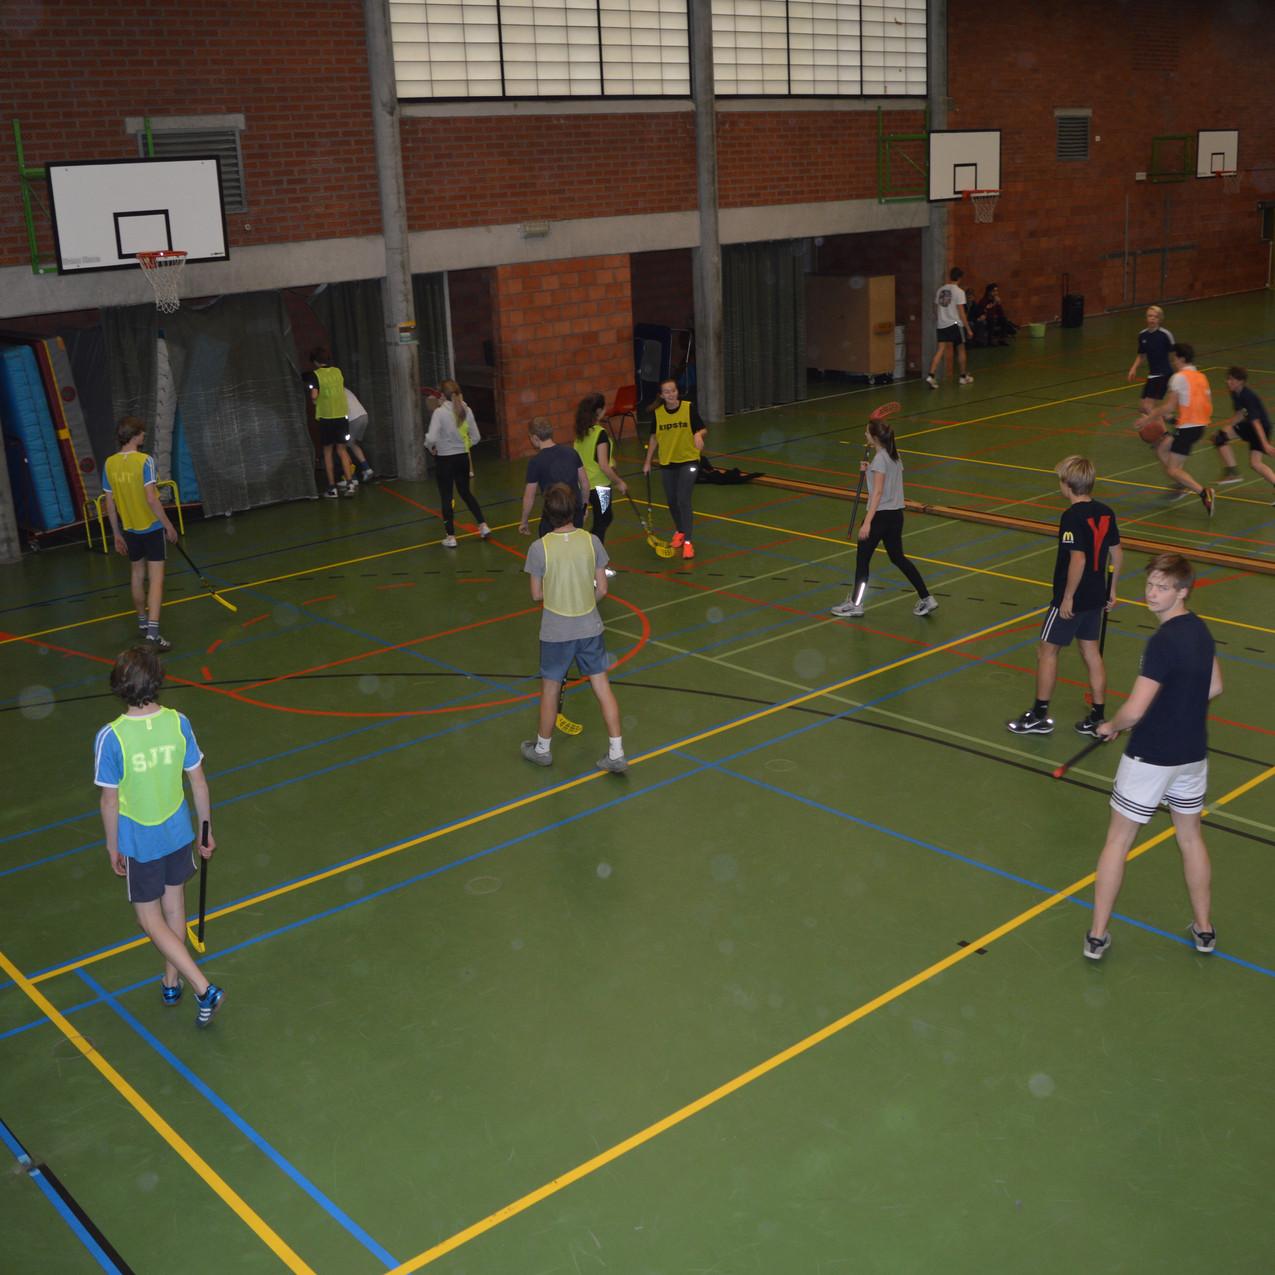 20171207 examensport (7)